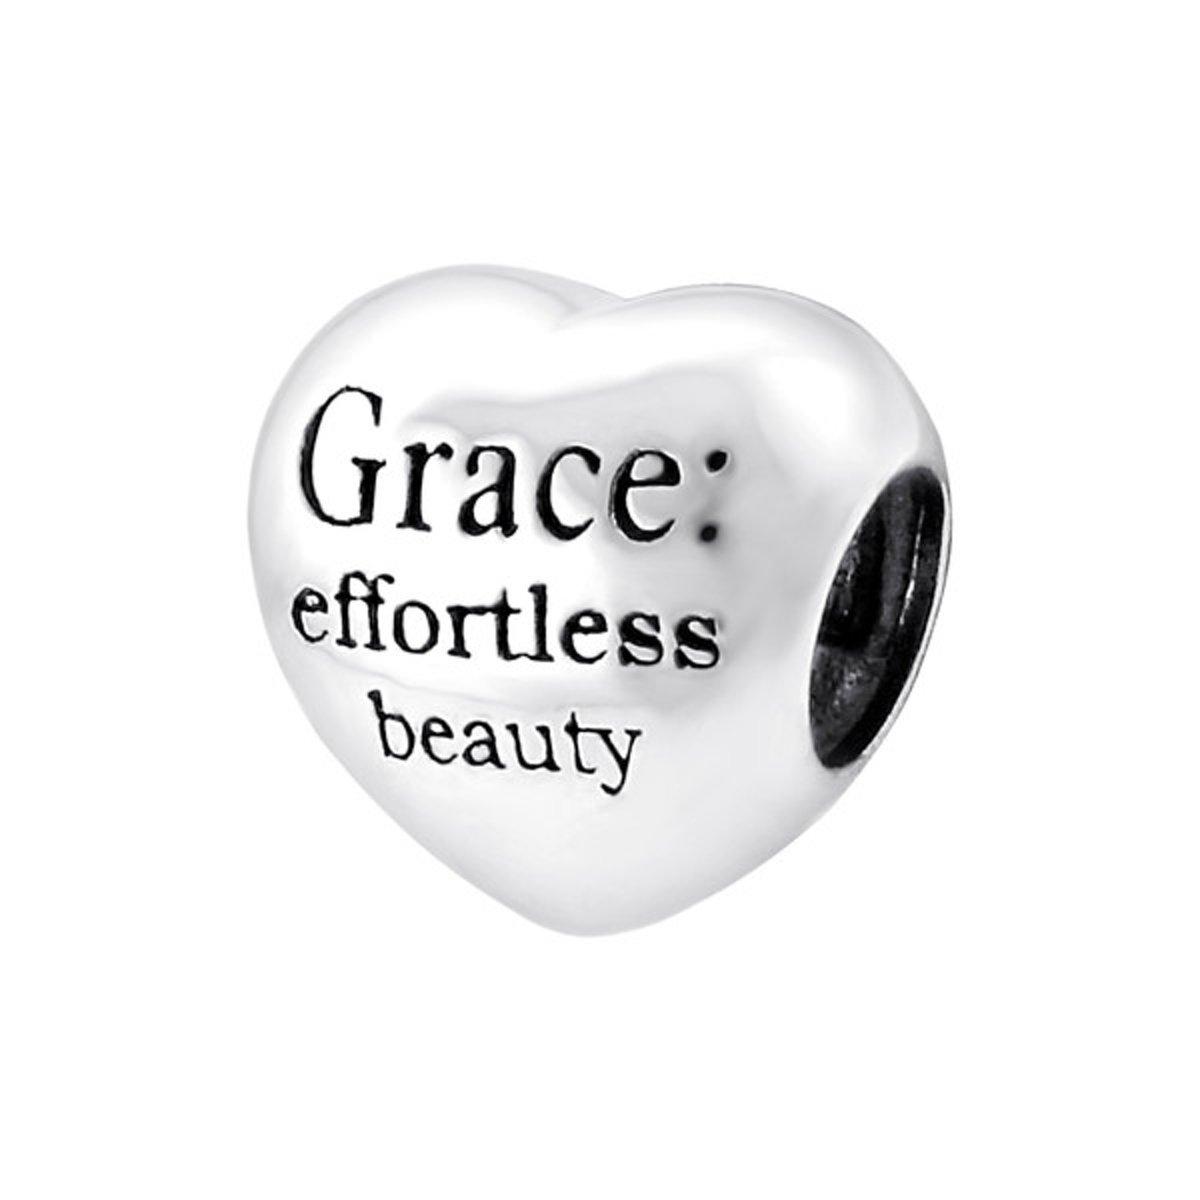 Grace bead | Bedel | Sterling 925 Silver (Echt zilver) | Past op vele merken | Nikkelvrij kopen